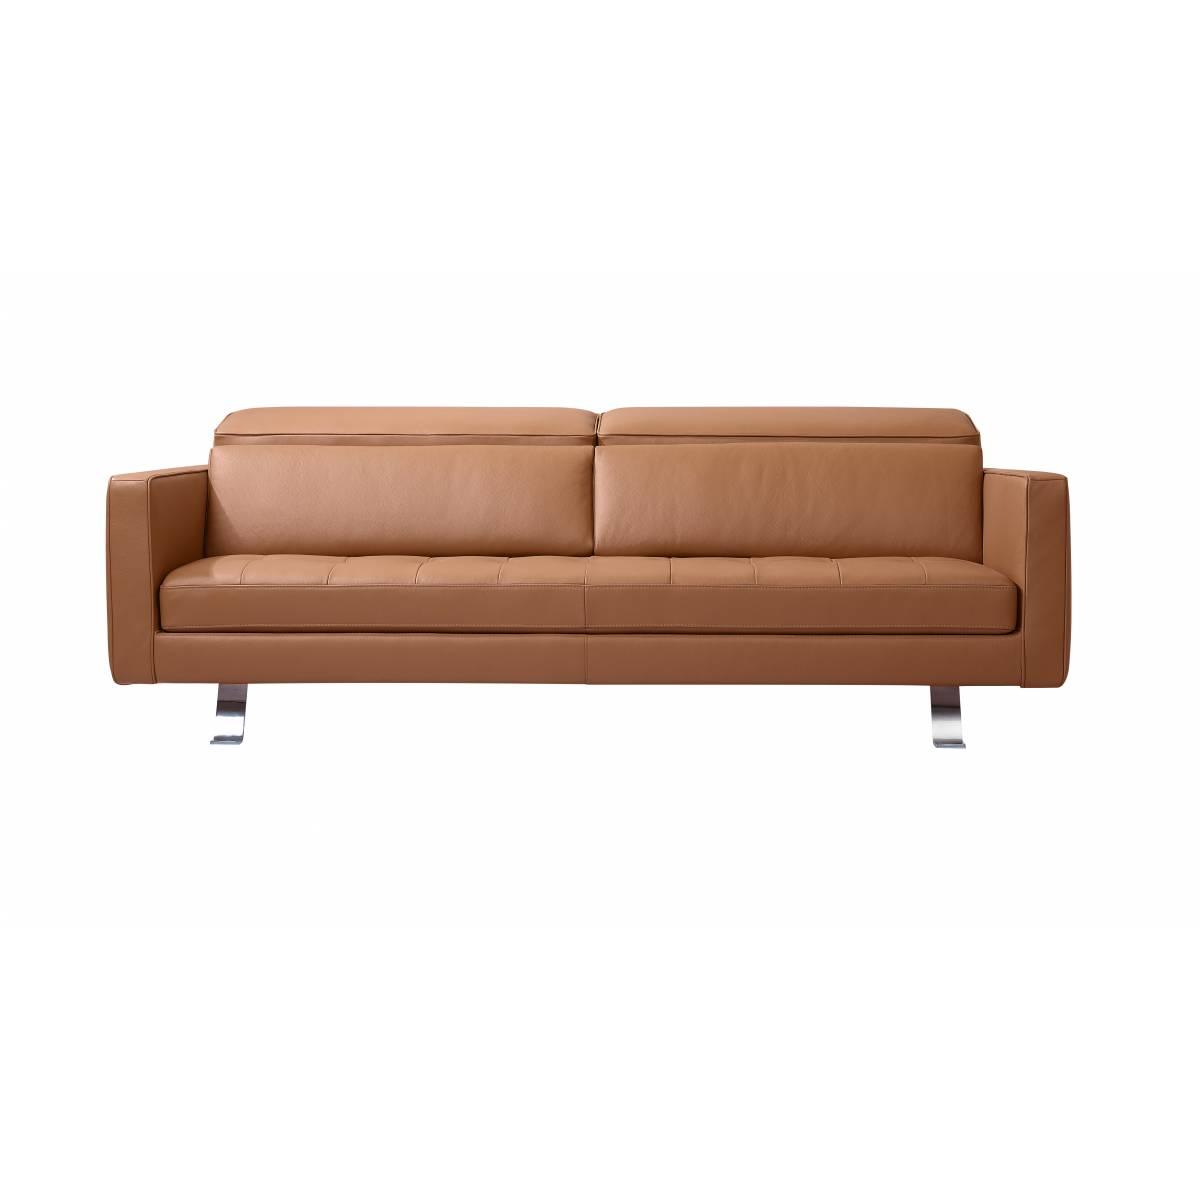 Sorano II Leather Sofa